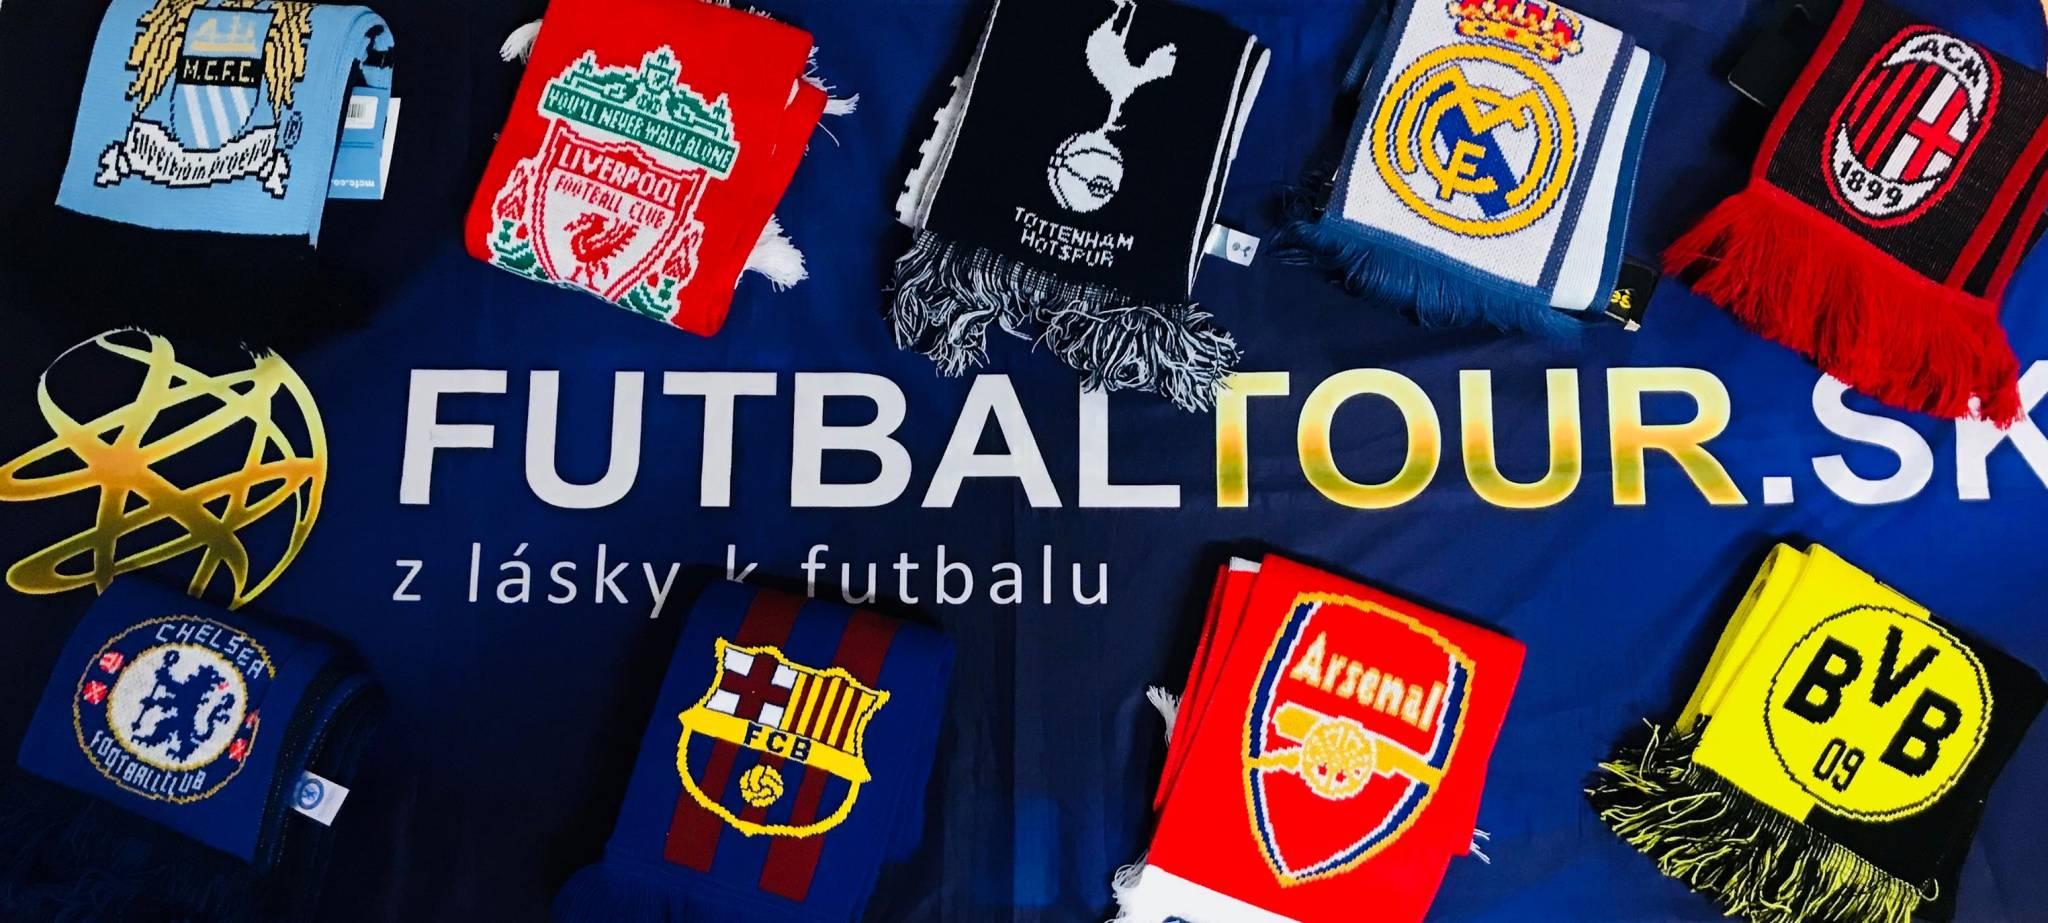 futbaltour eshop futbalove saly